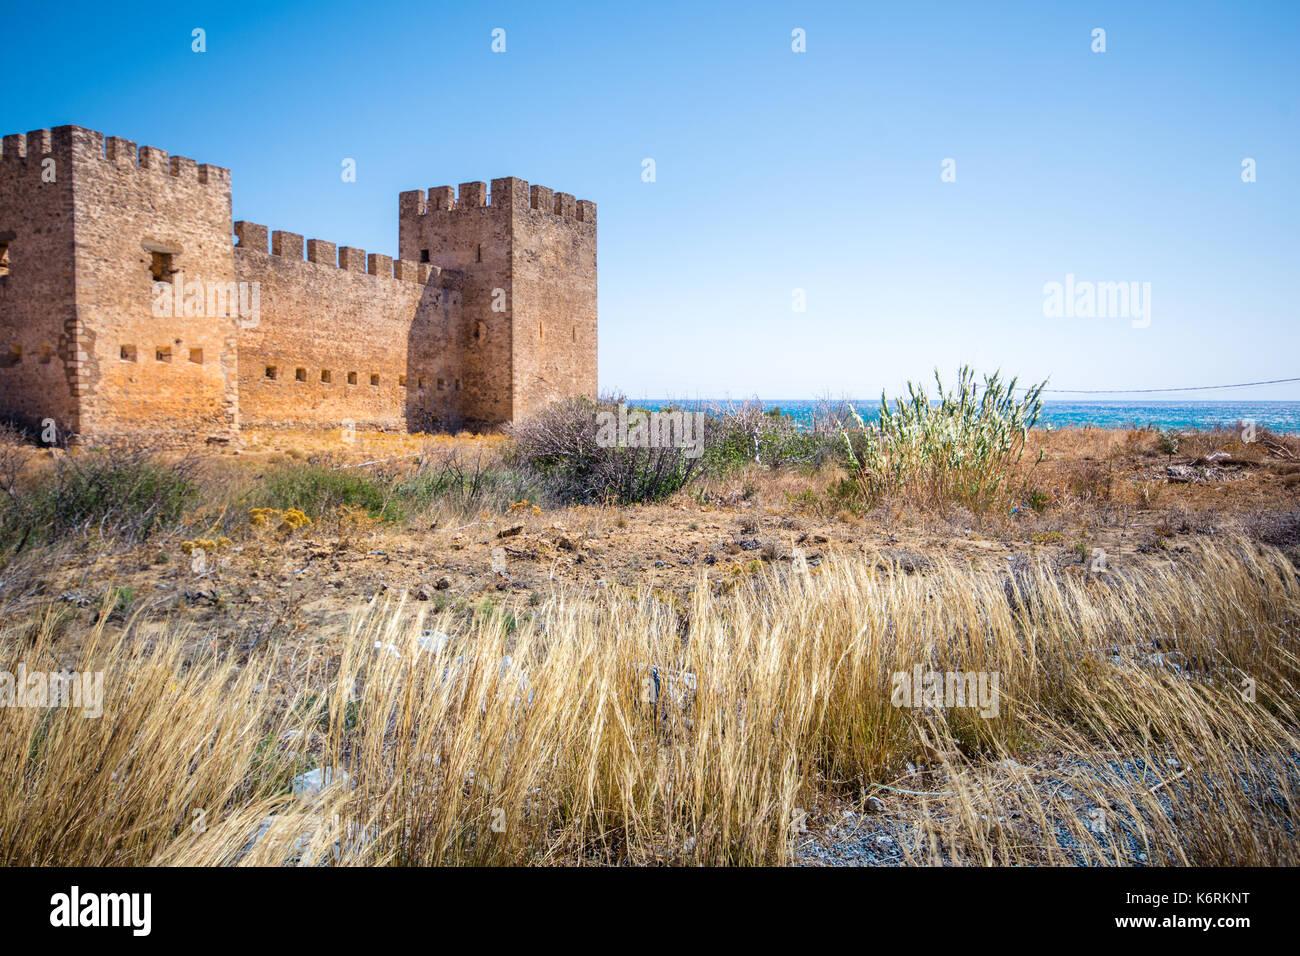 Castle at Frangokastello beach, Crete, Greece - Stock Image